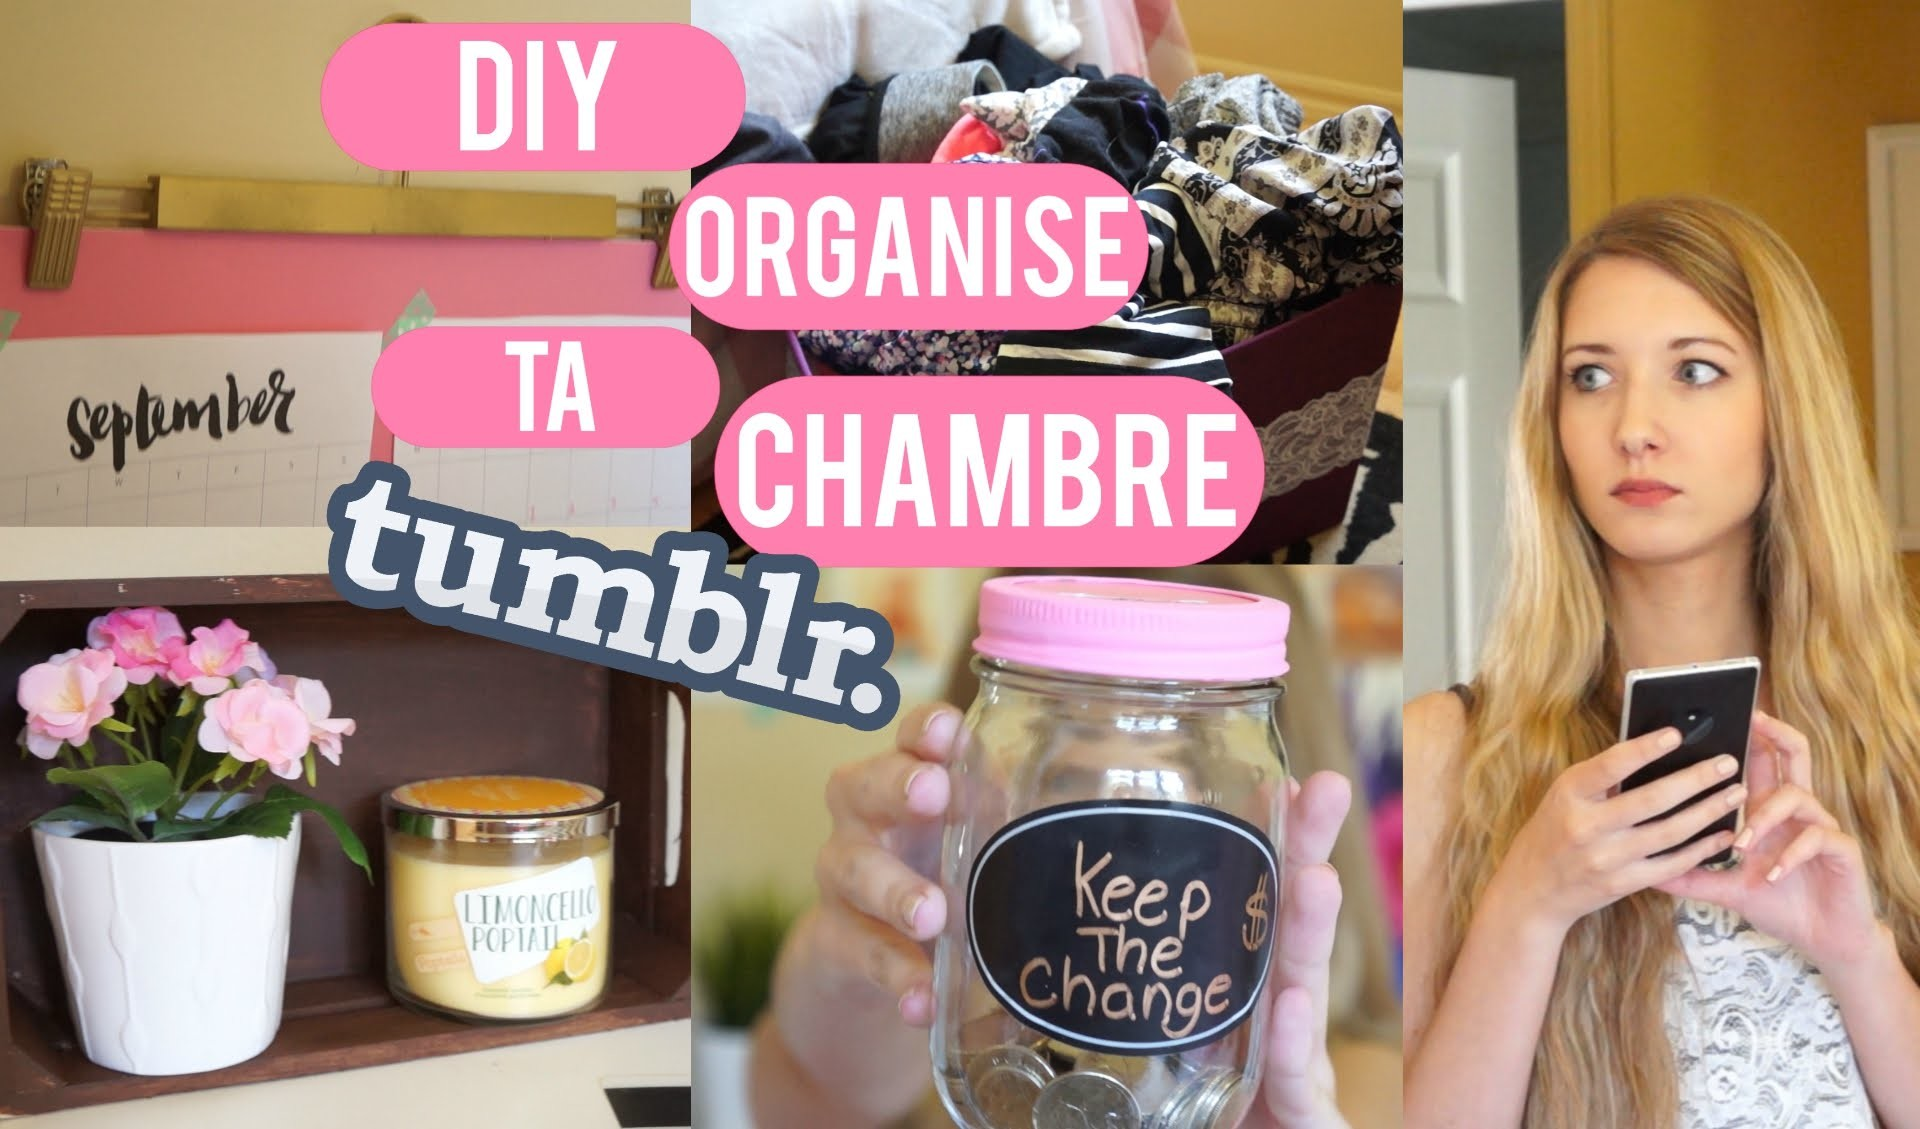 DIY | Organise ta chambre inspiration TUMBLR !